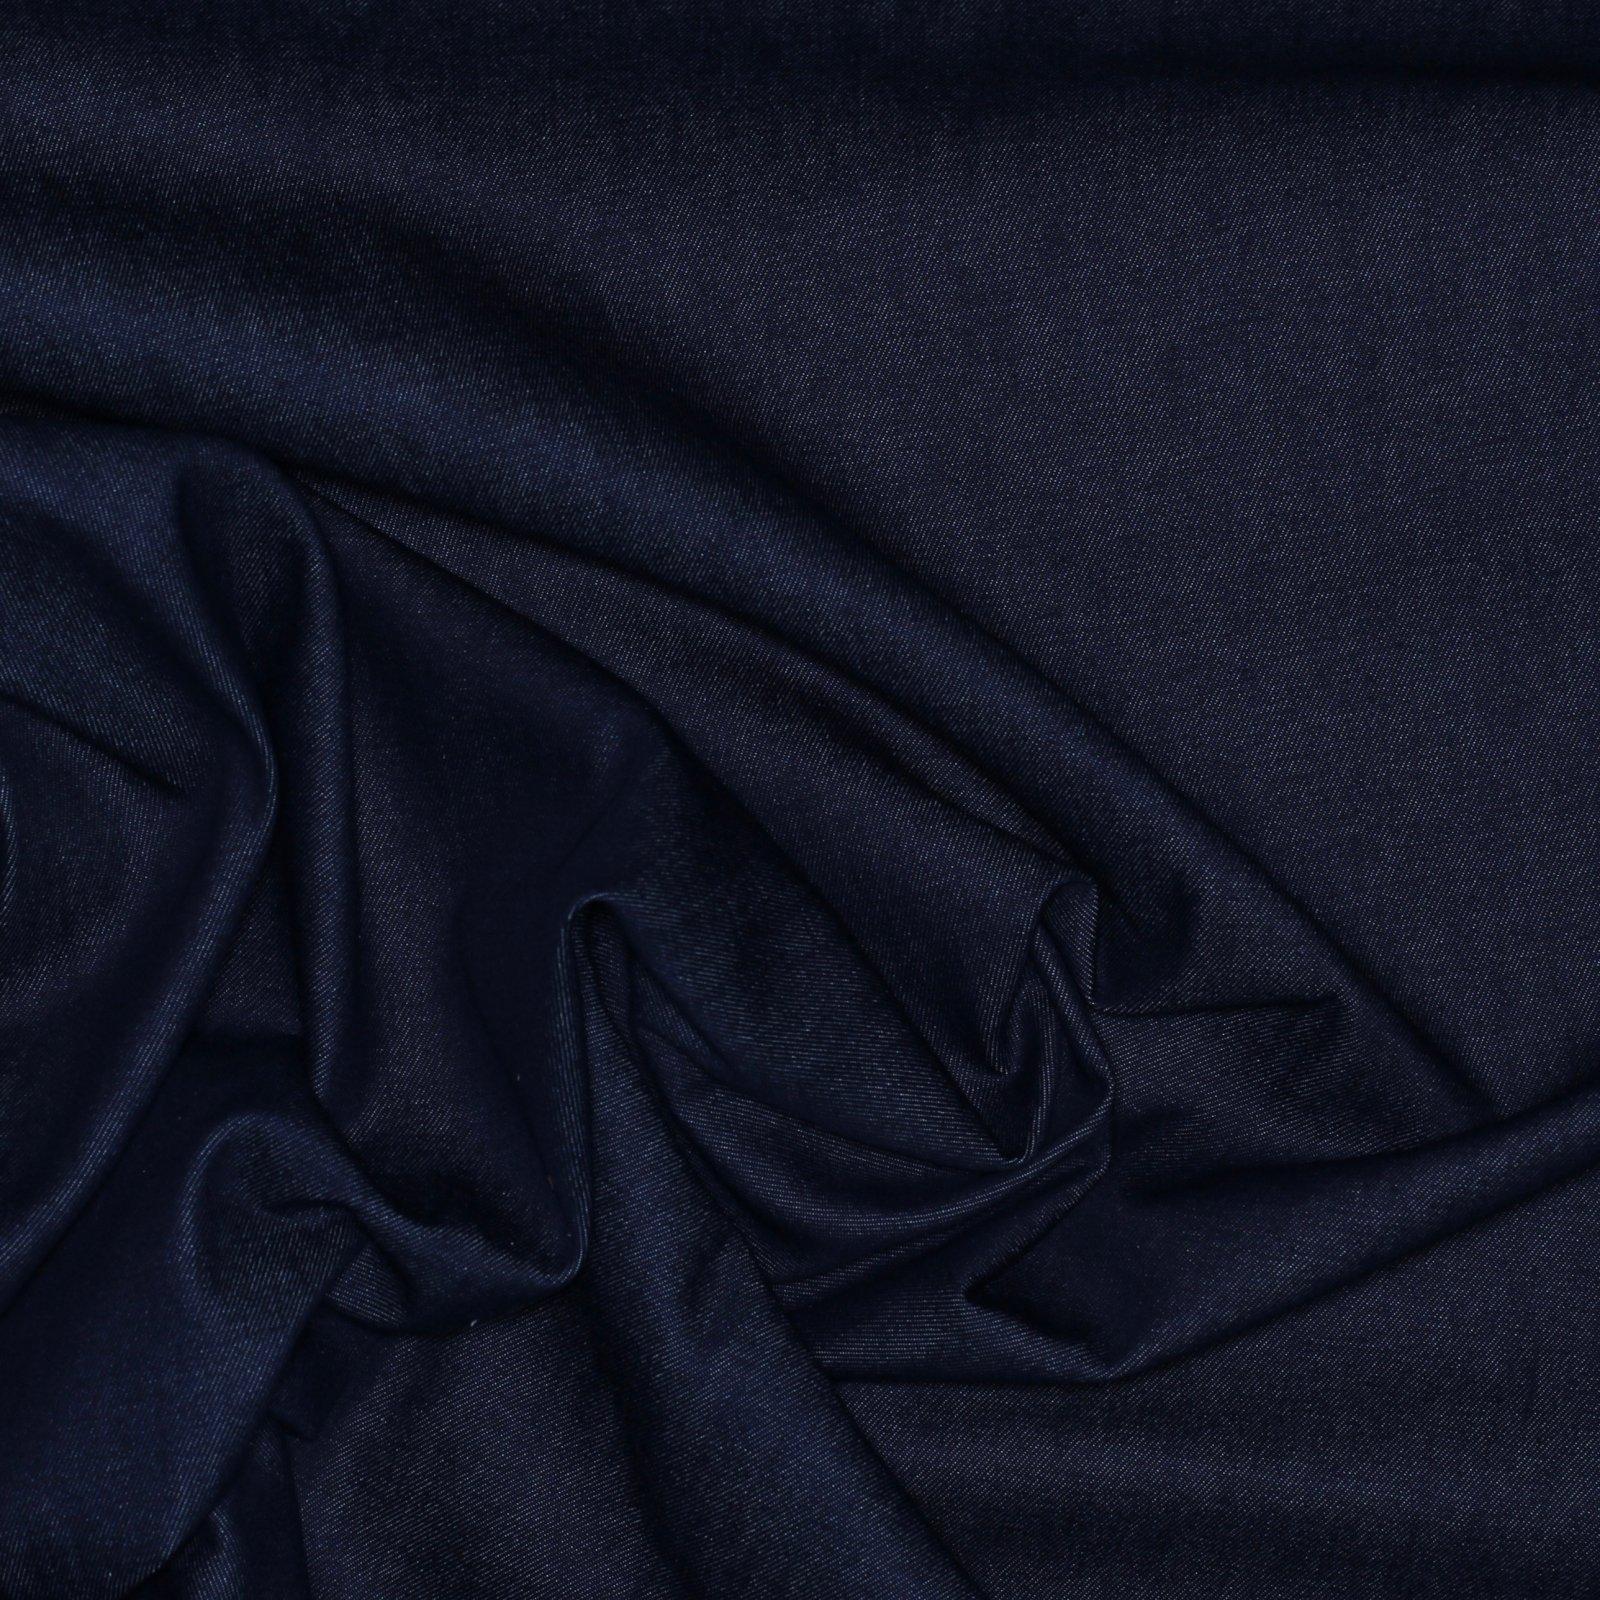 Deep Blue Cotton Denim